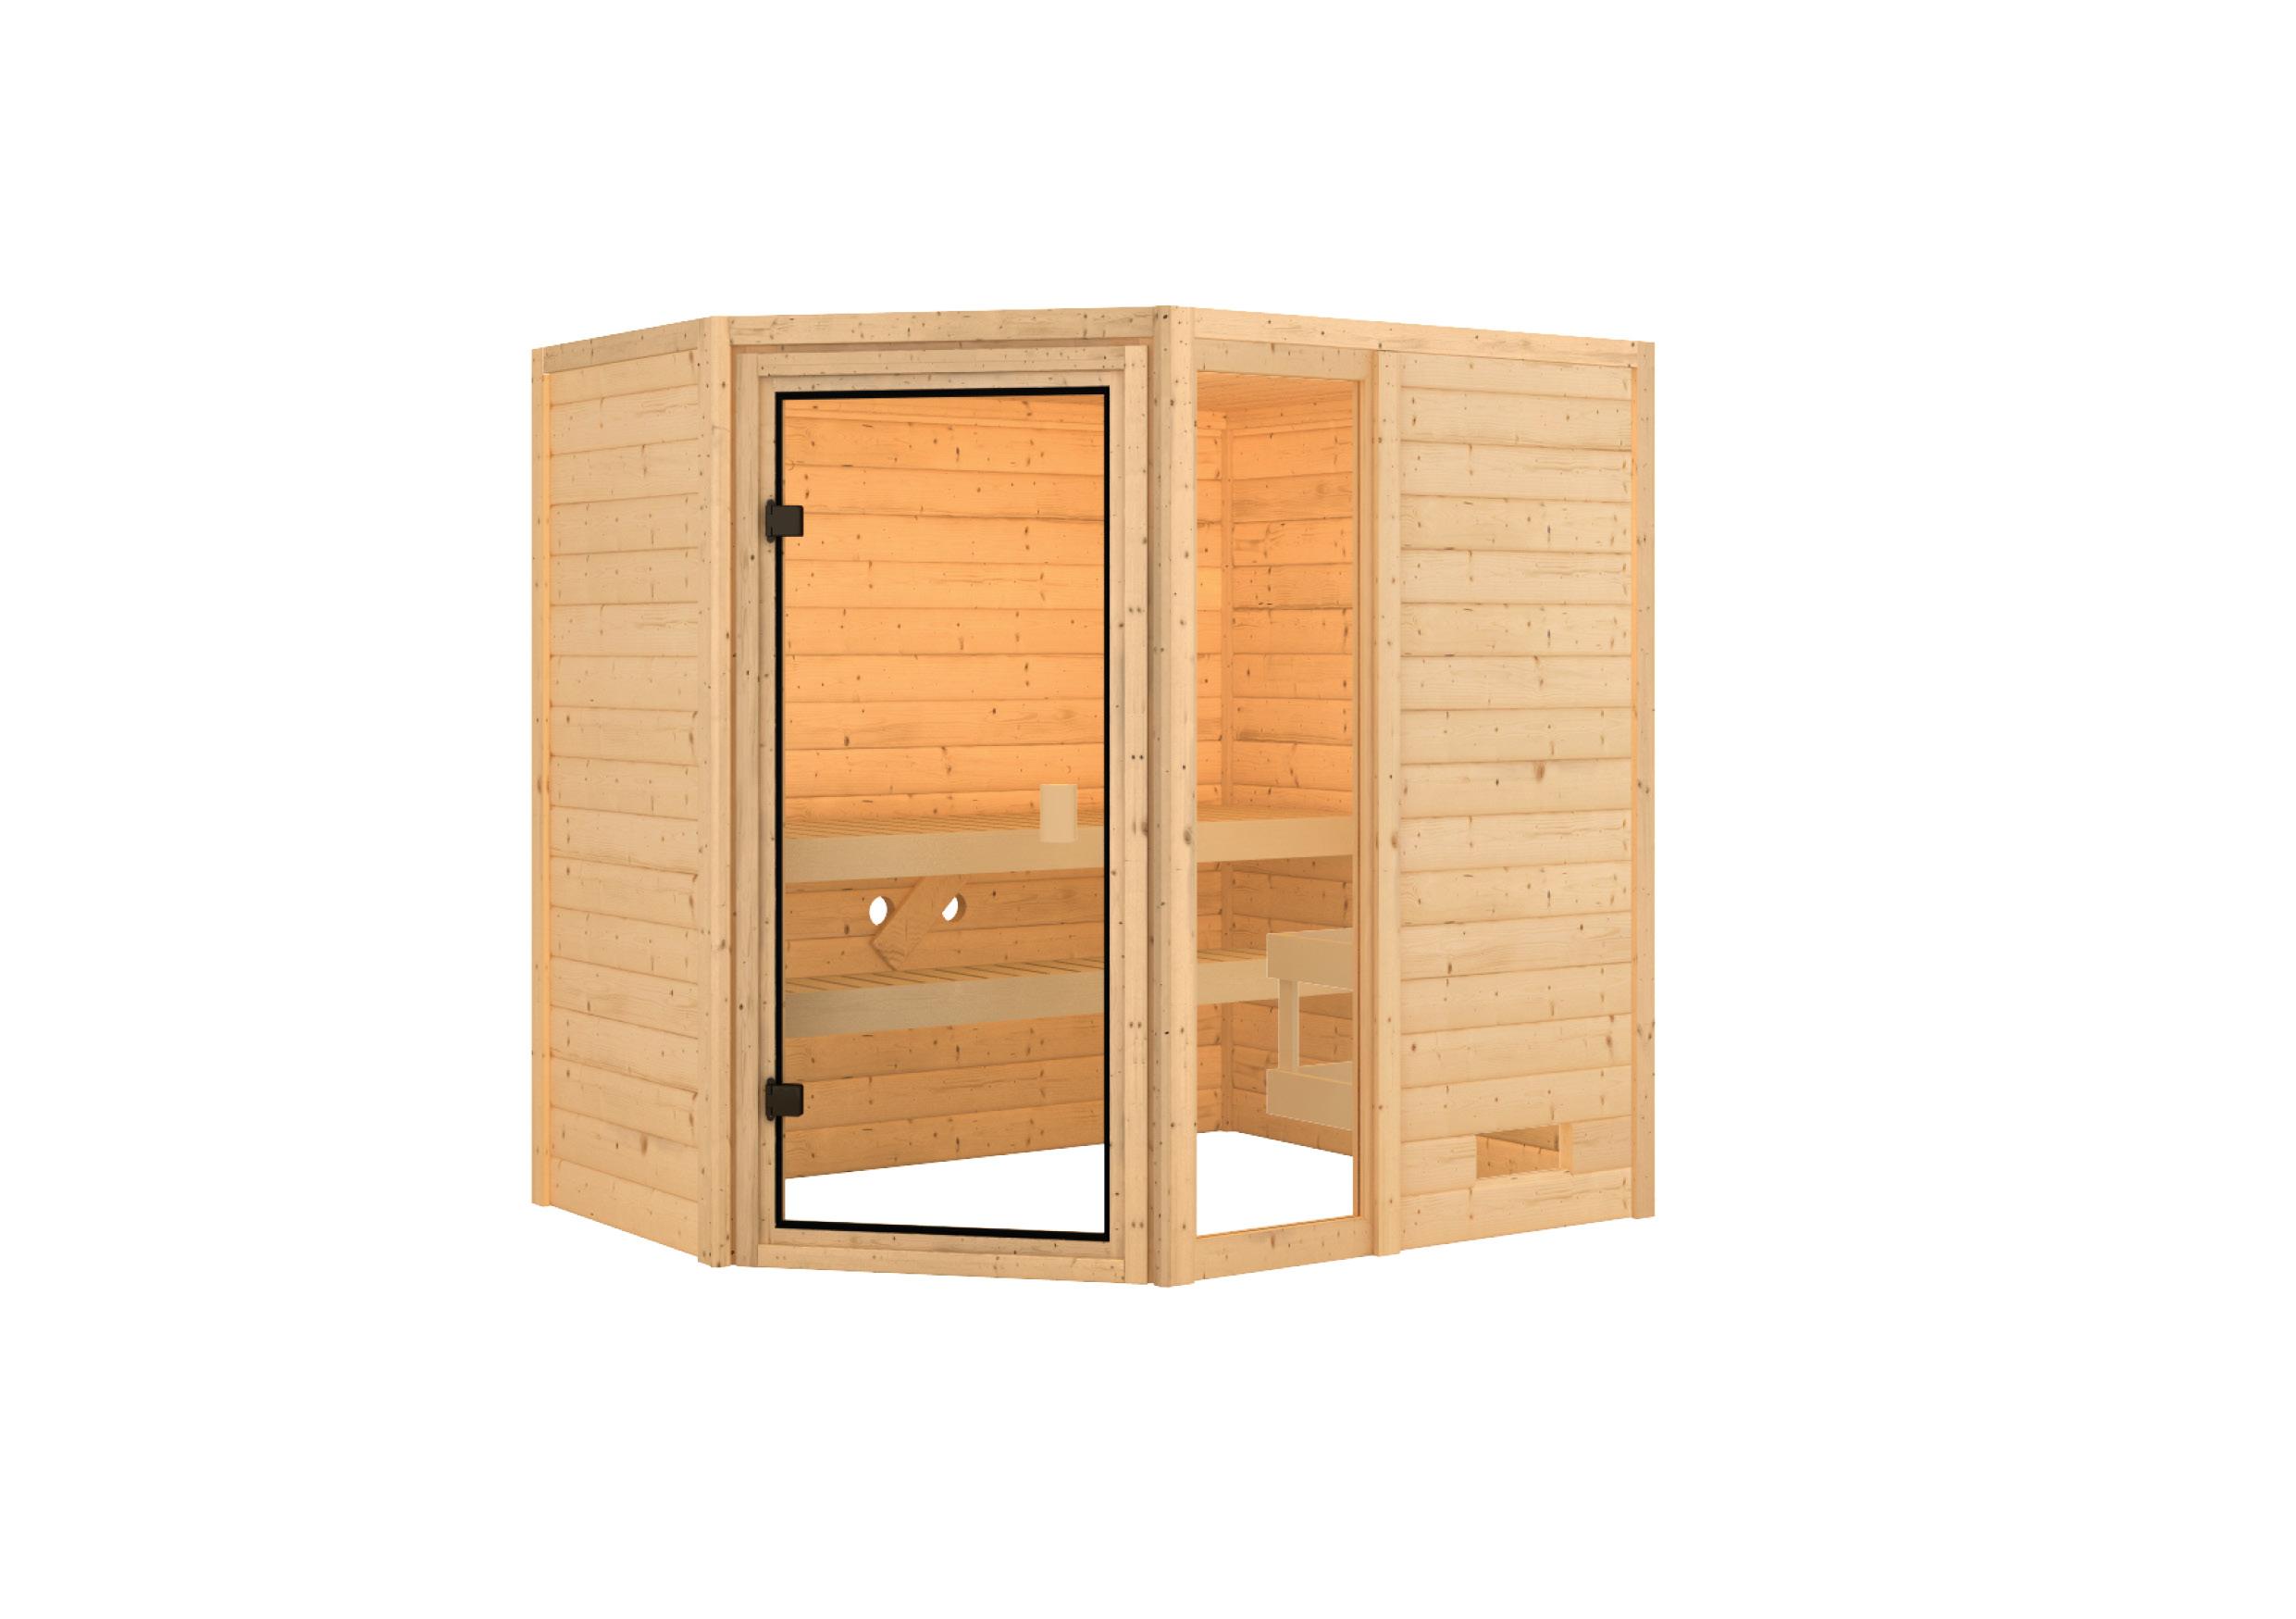 Woodfeeling Sauna Jada 38mm ohne Saunaofen Bild 7